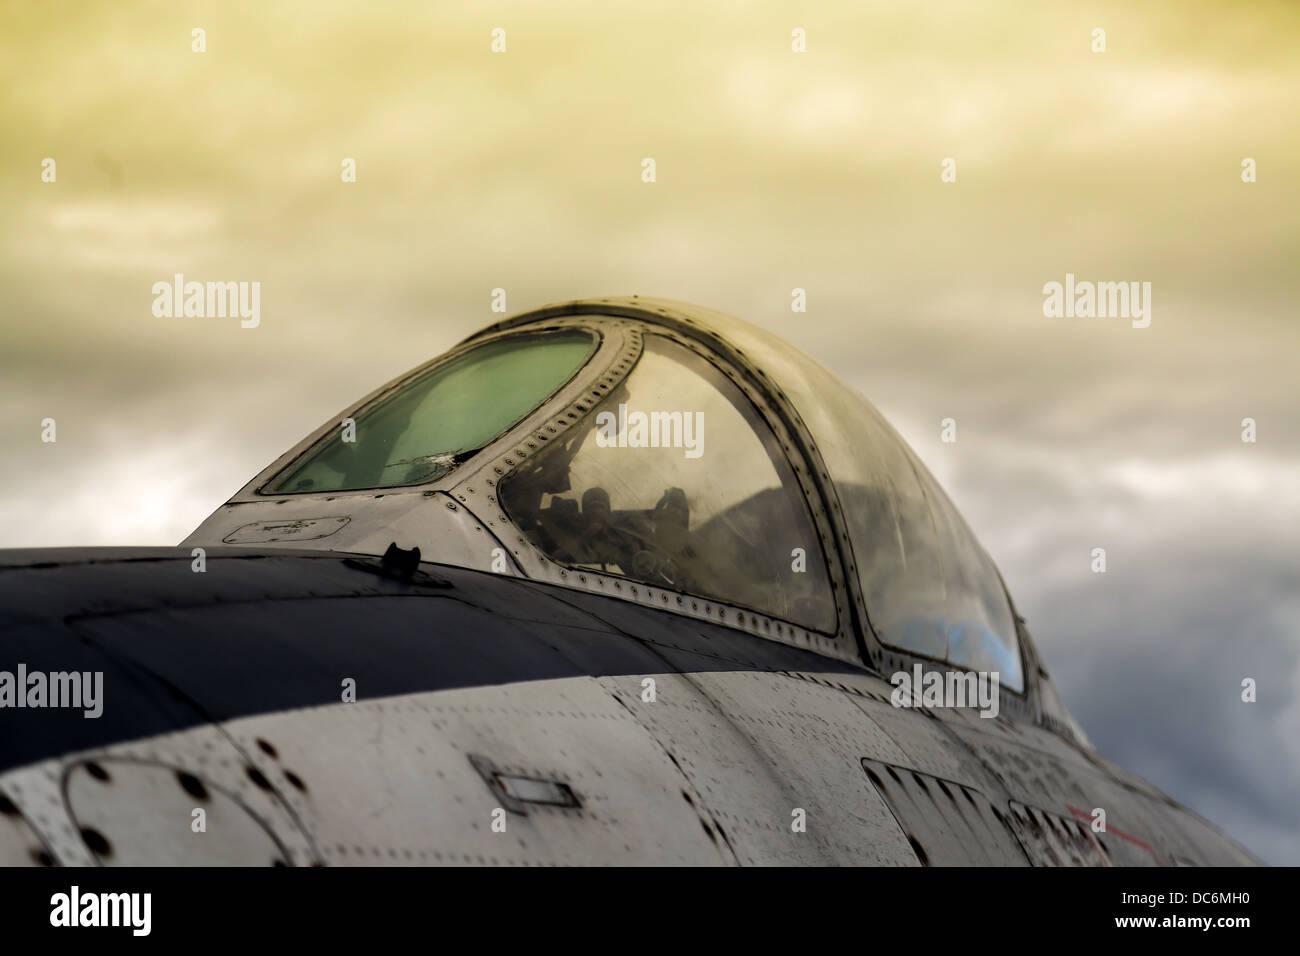 Vintage military airplane - Stock Image